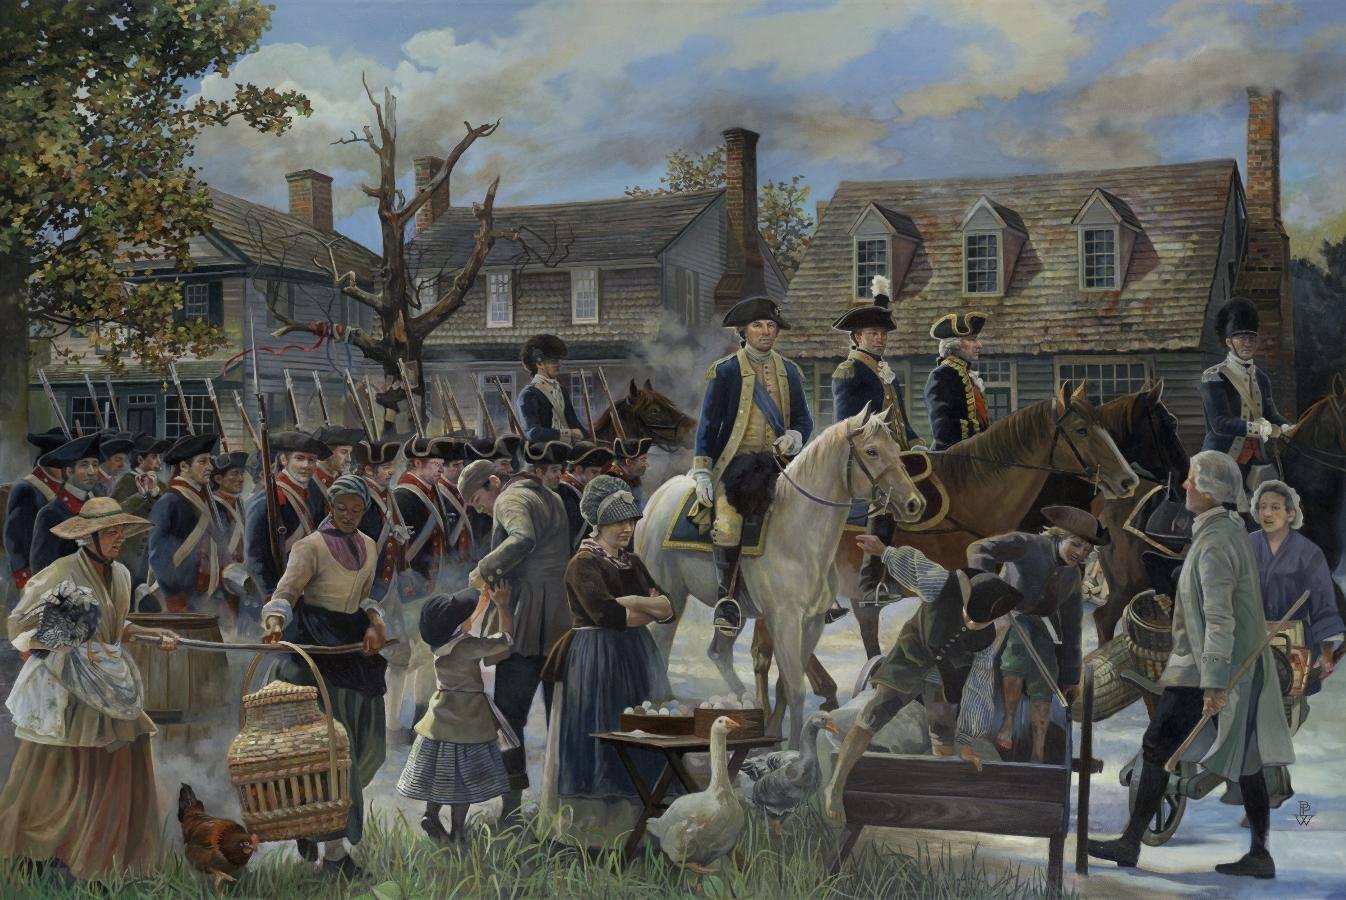 Williamsburg to Yorktown by Pamela Patrick White